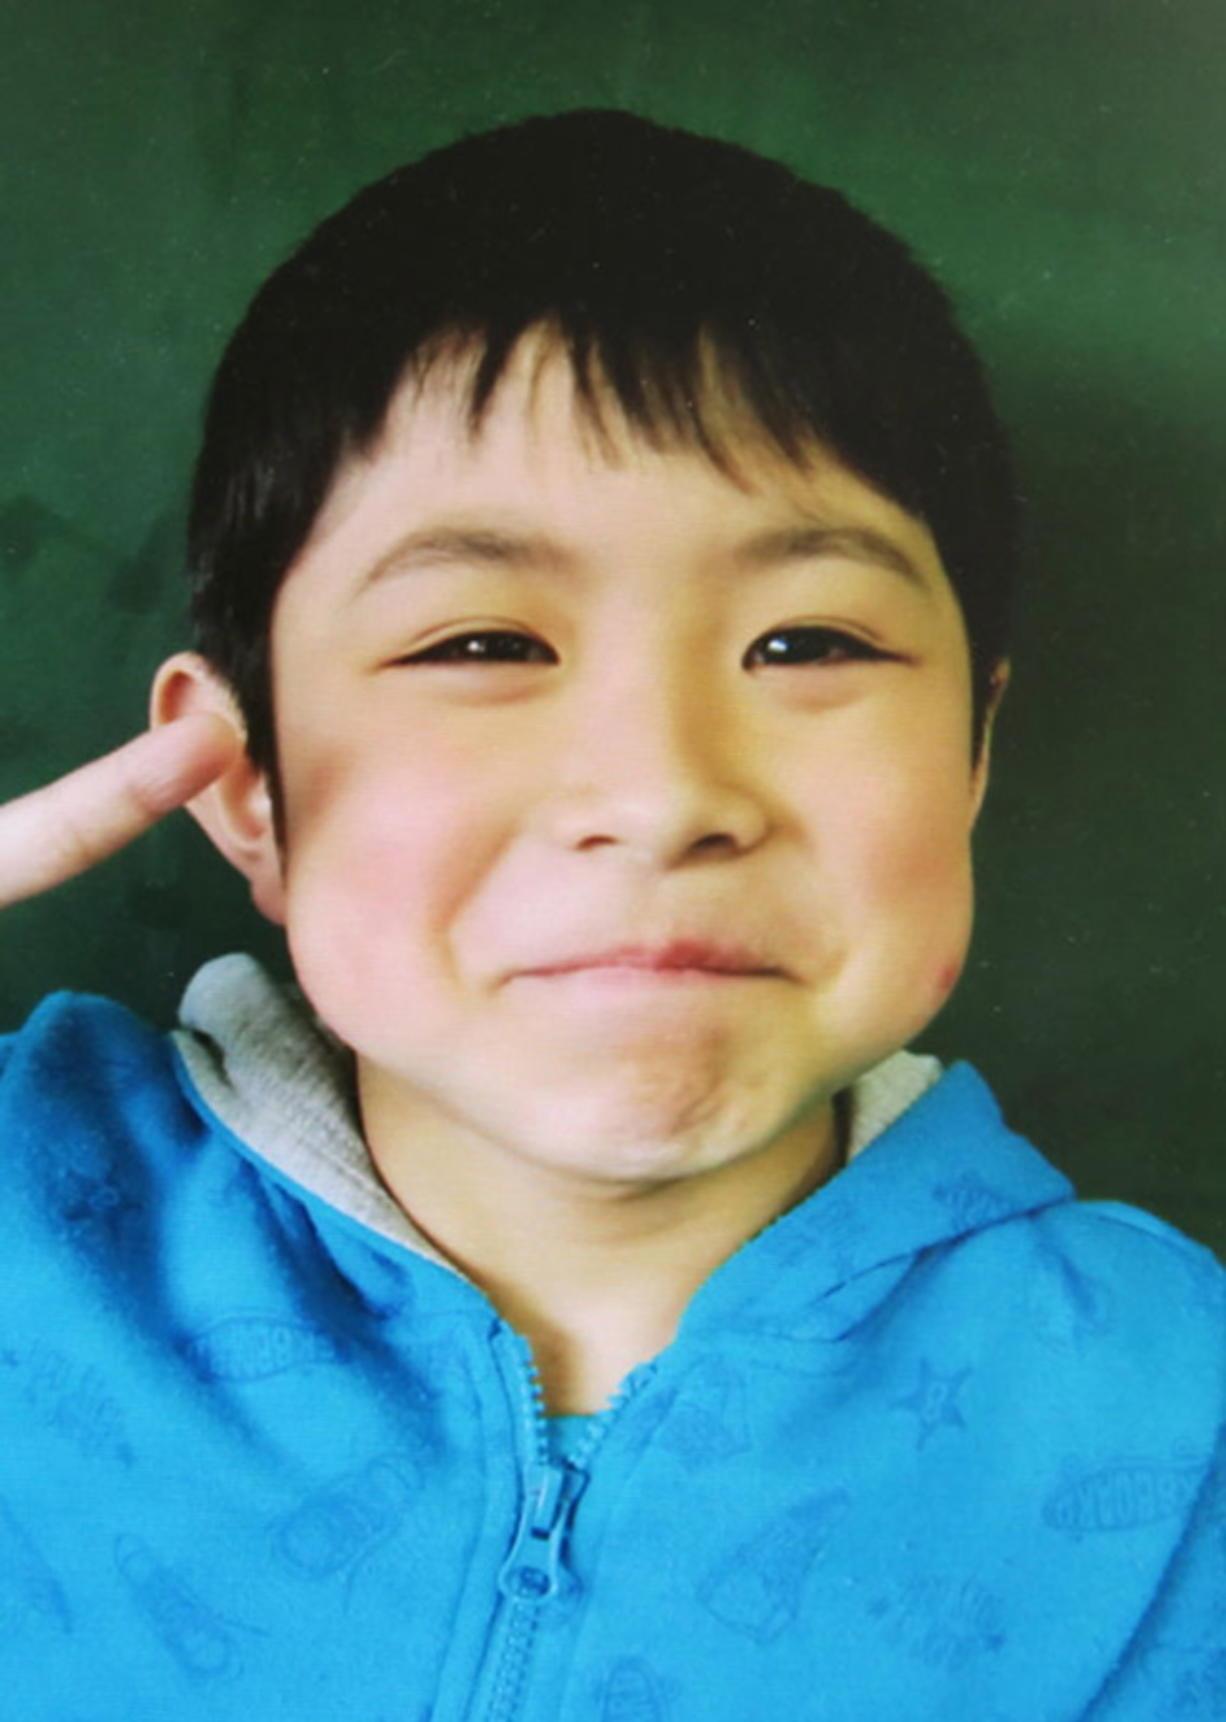 Japan praises boy who survived alone, wonders about parents